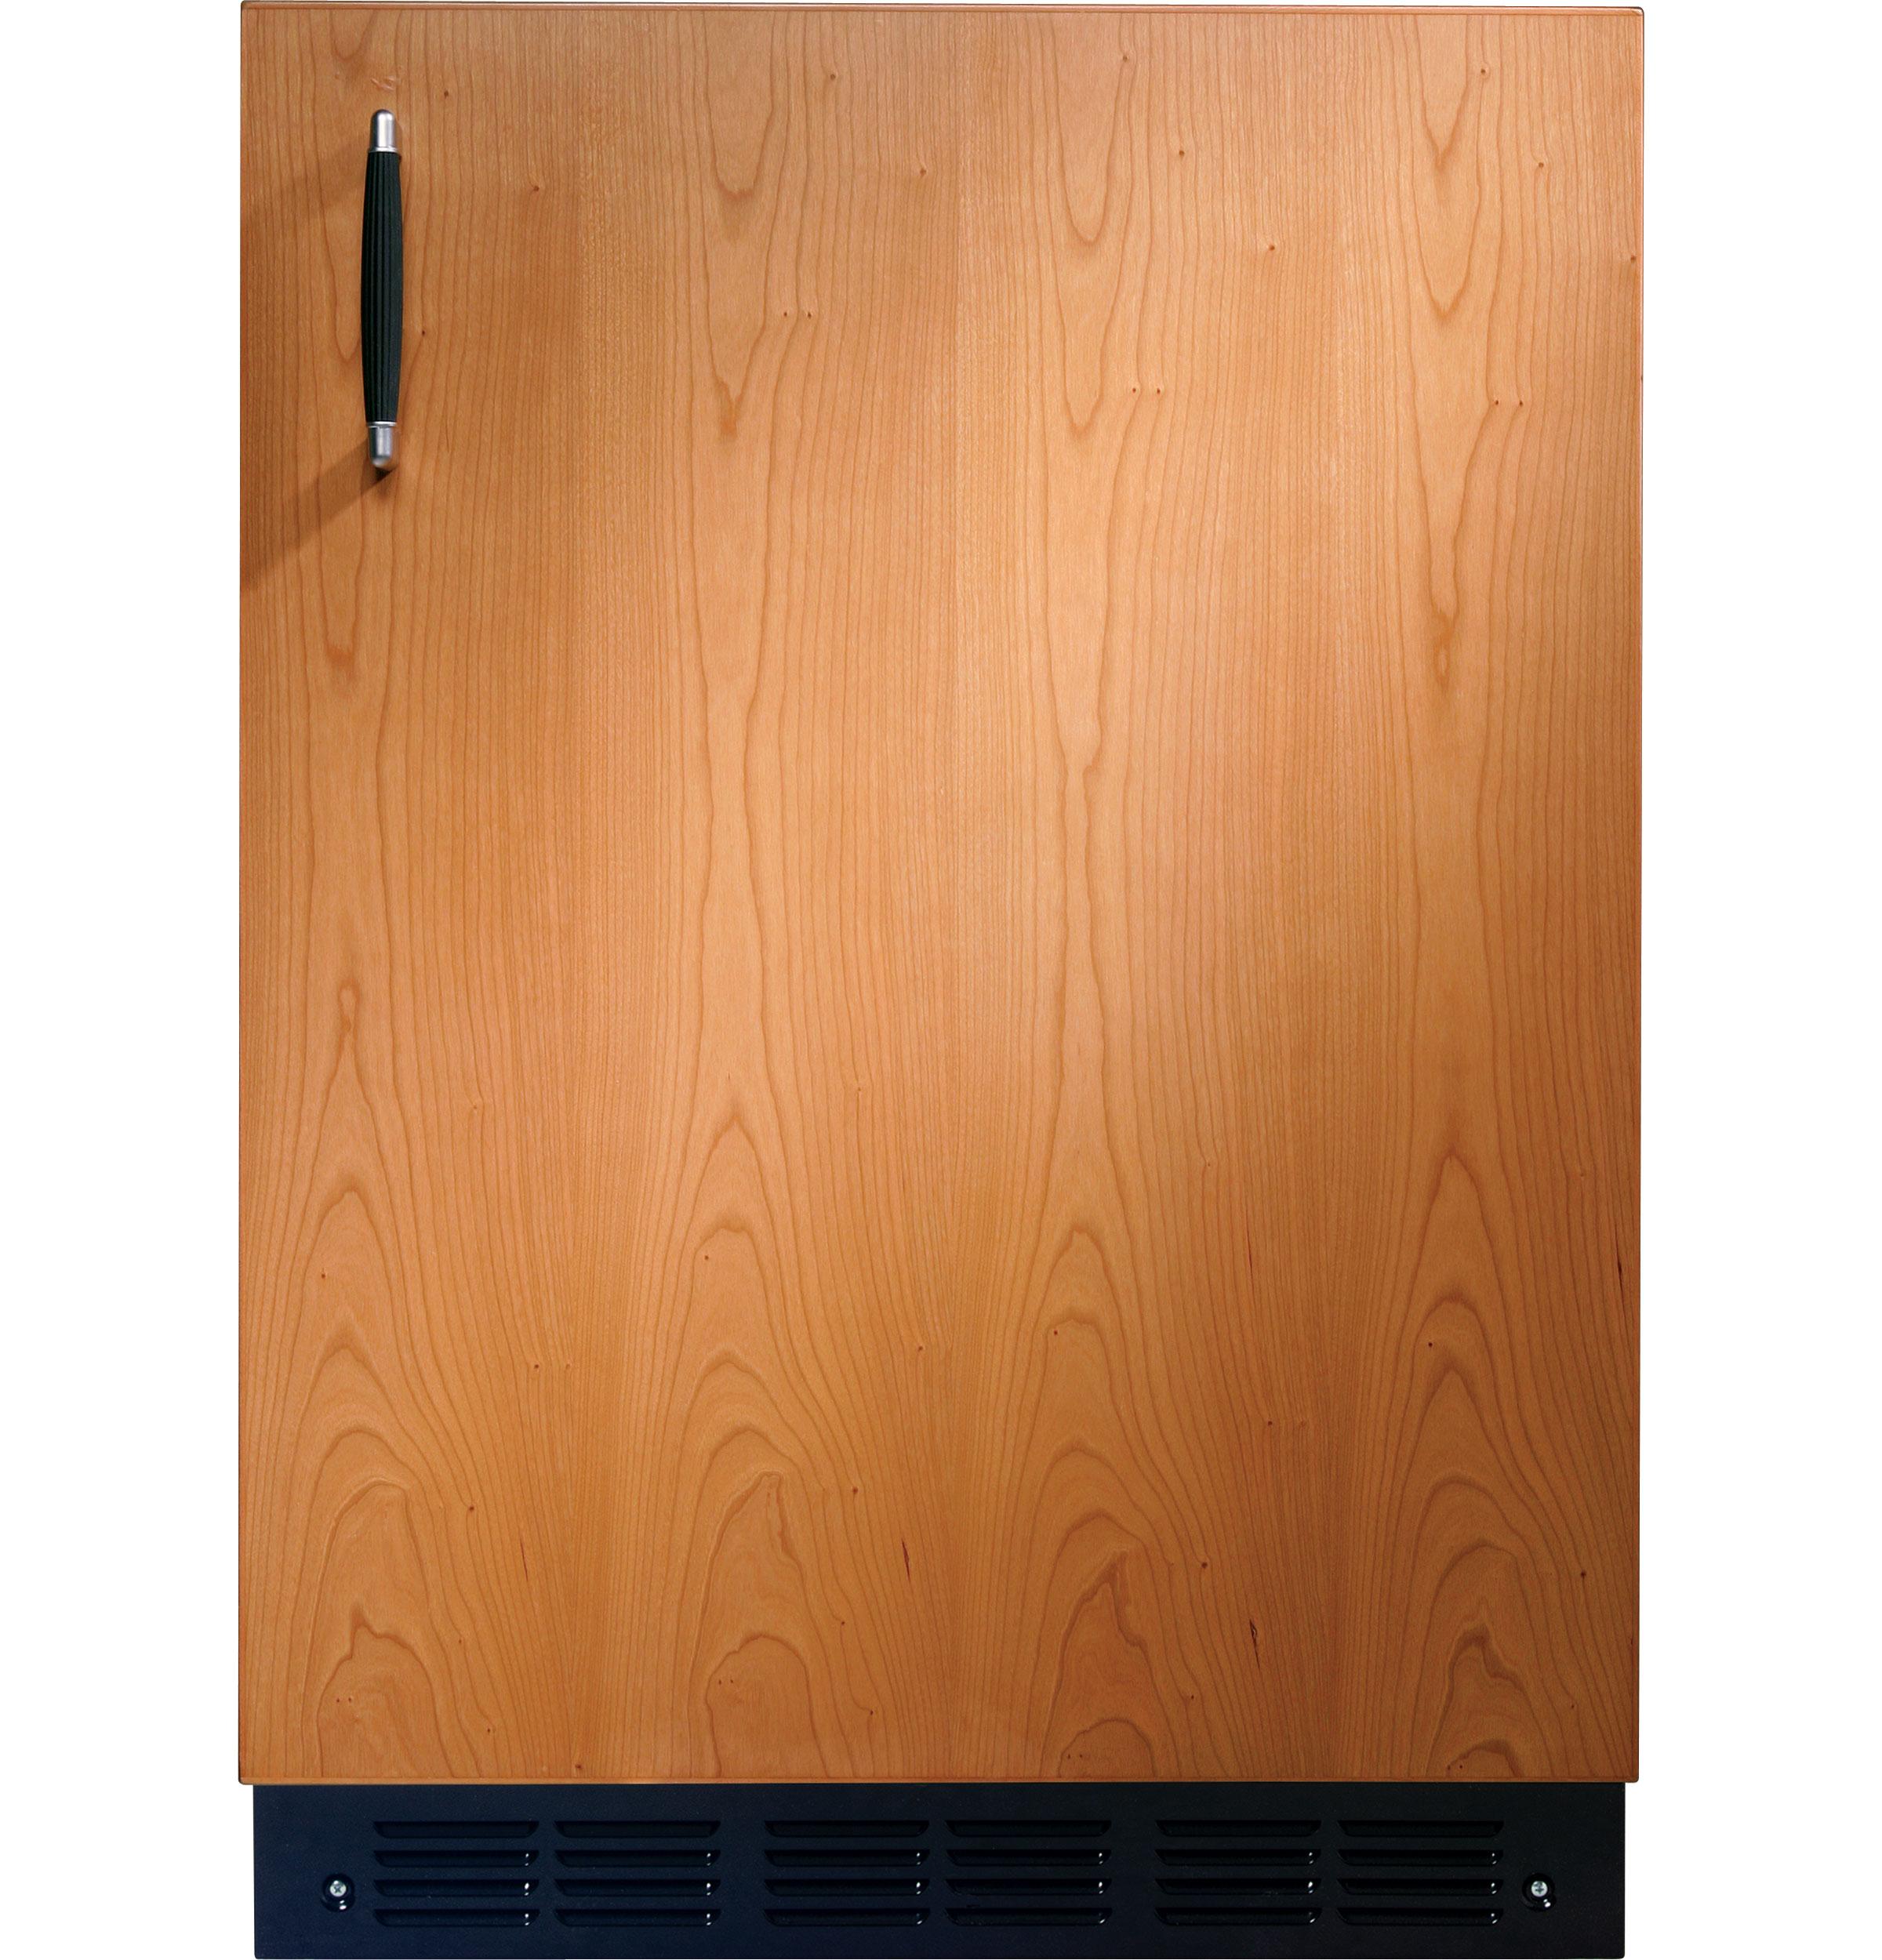 <br/><br/> 美國GE奇異 ZIFI240PII 冷藏小冰箱(左開/右開)(崁門板)(183L)【零利率】 ※熱線07-7428010<br/><br/>